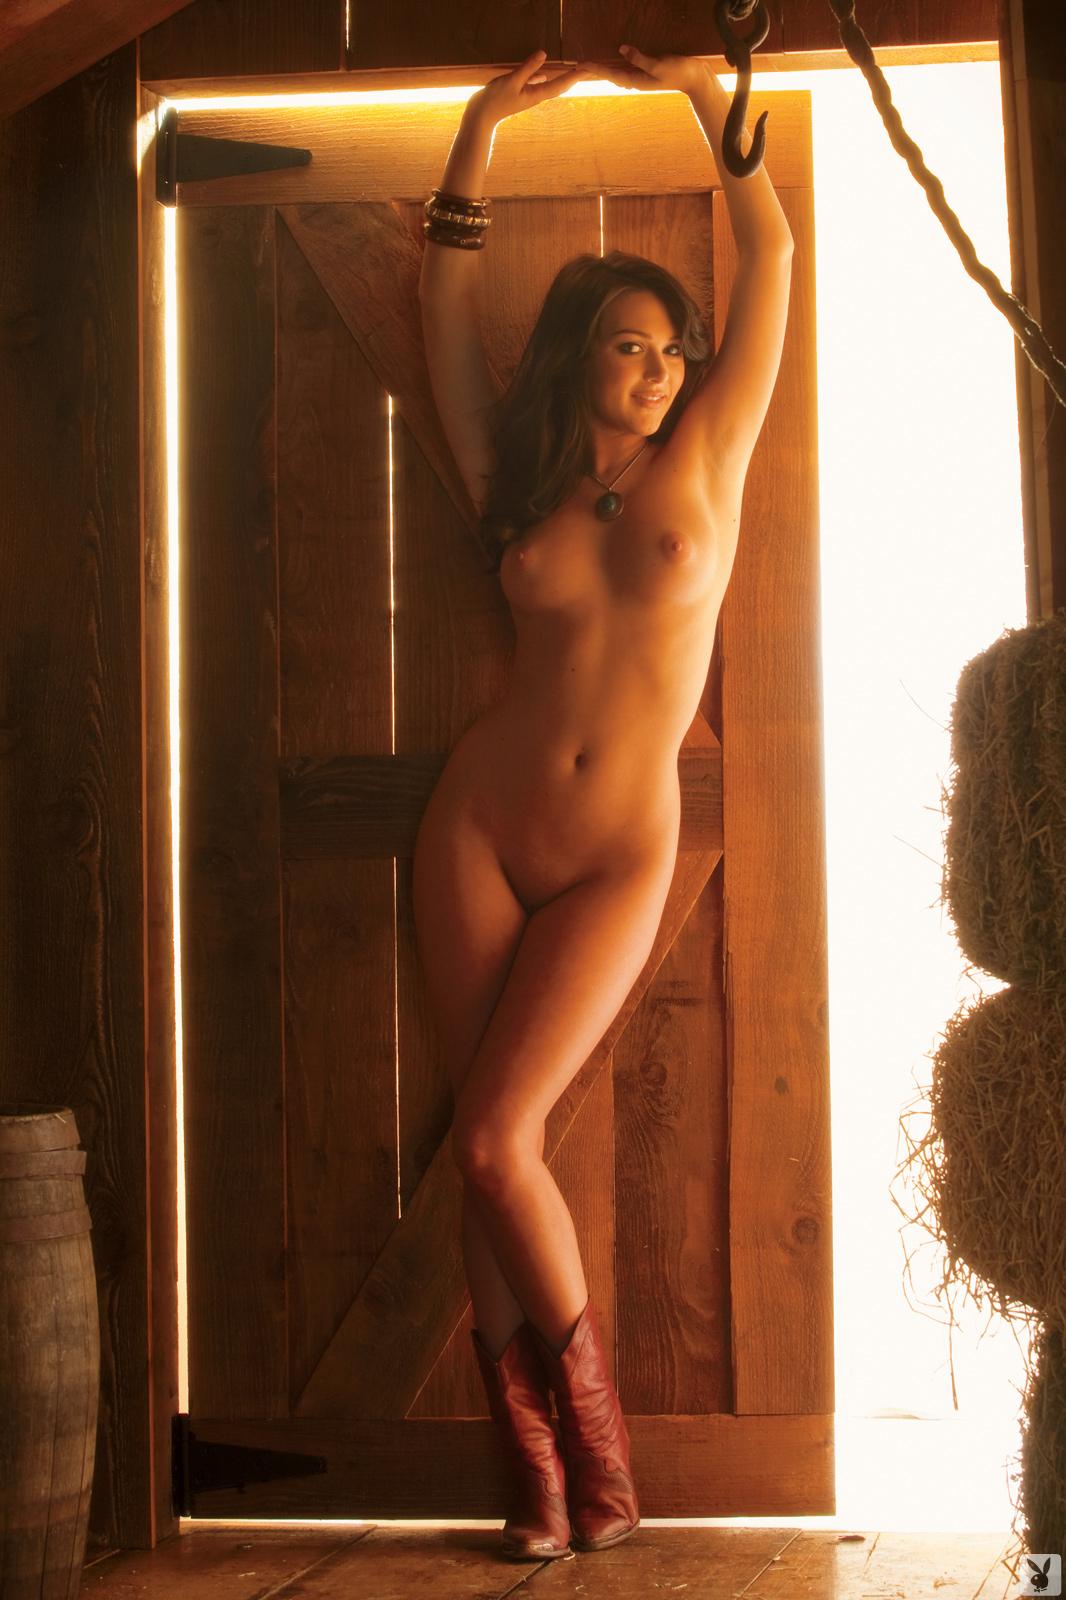 rainy-day-jordan-barn-naked-cowgirl-ranch-playboy-12